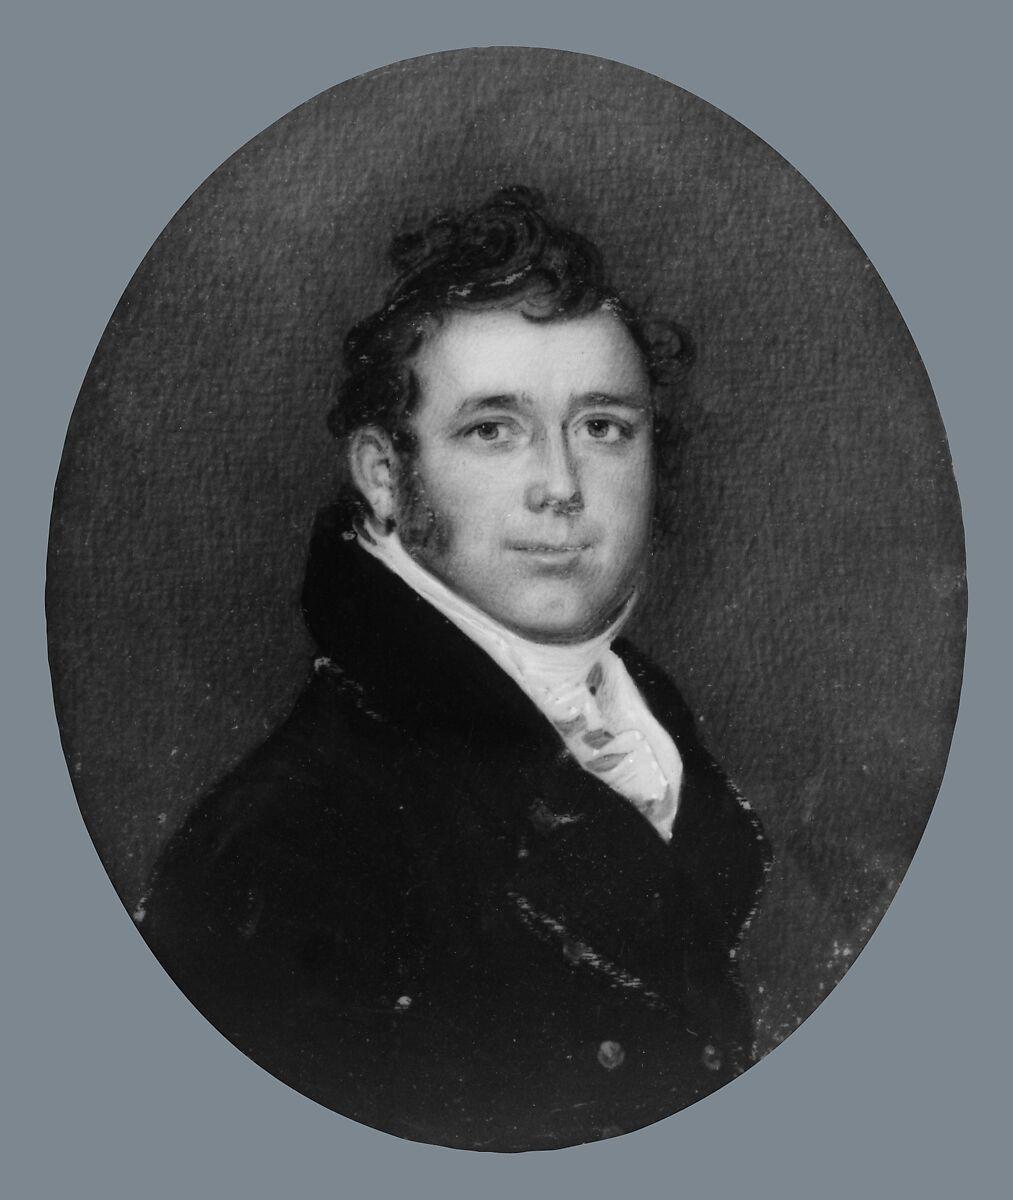 William Edward Wilmerding, Benjamin Trott (ca. 1770–1843), Watercolor on ivory, American